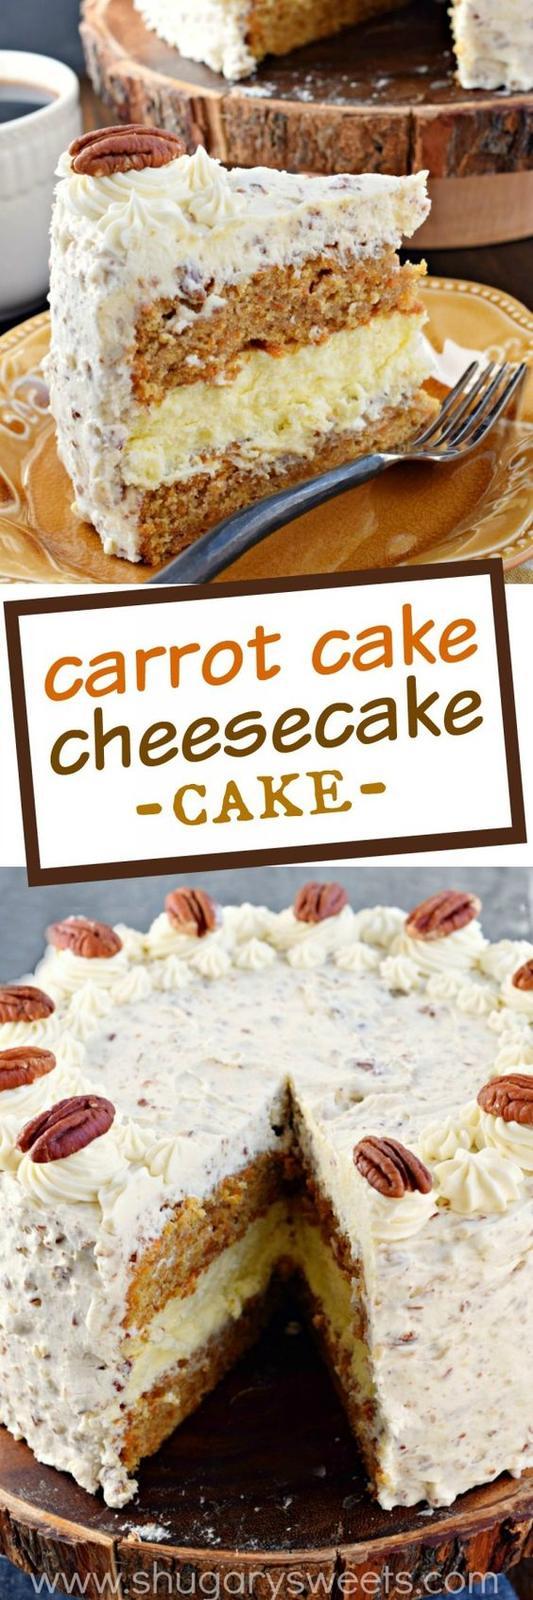 Americké koláčky - Carrot Cake Cheesecake Cake